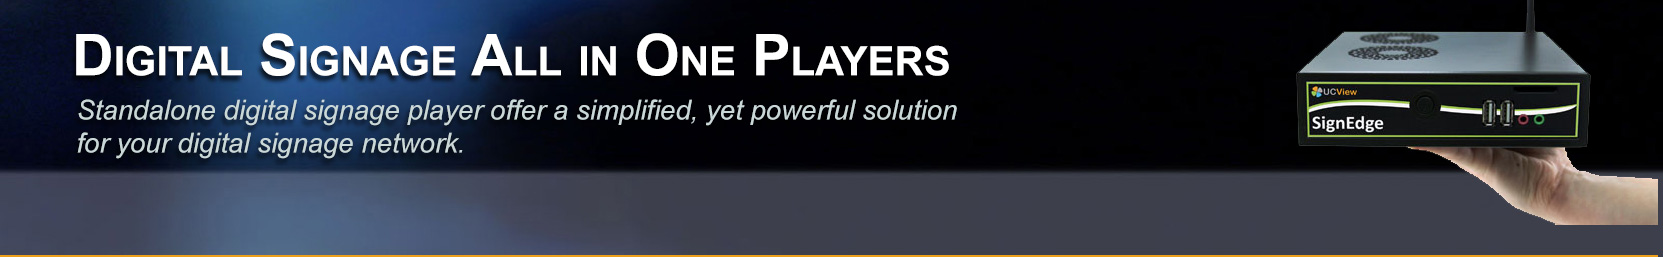 Digital Signage Standalone Players Series